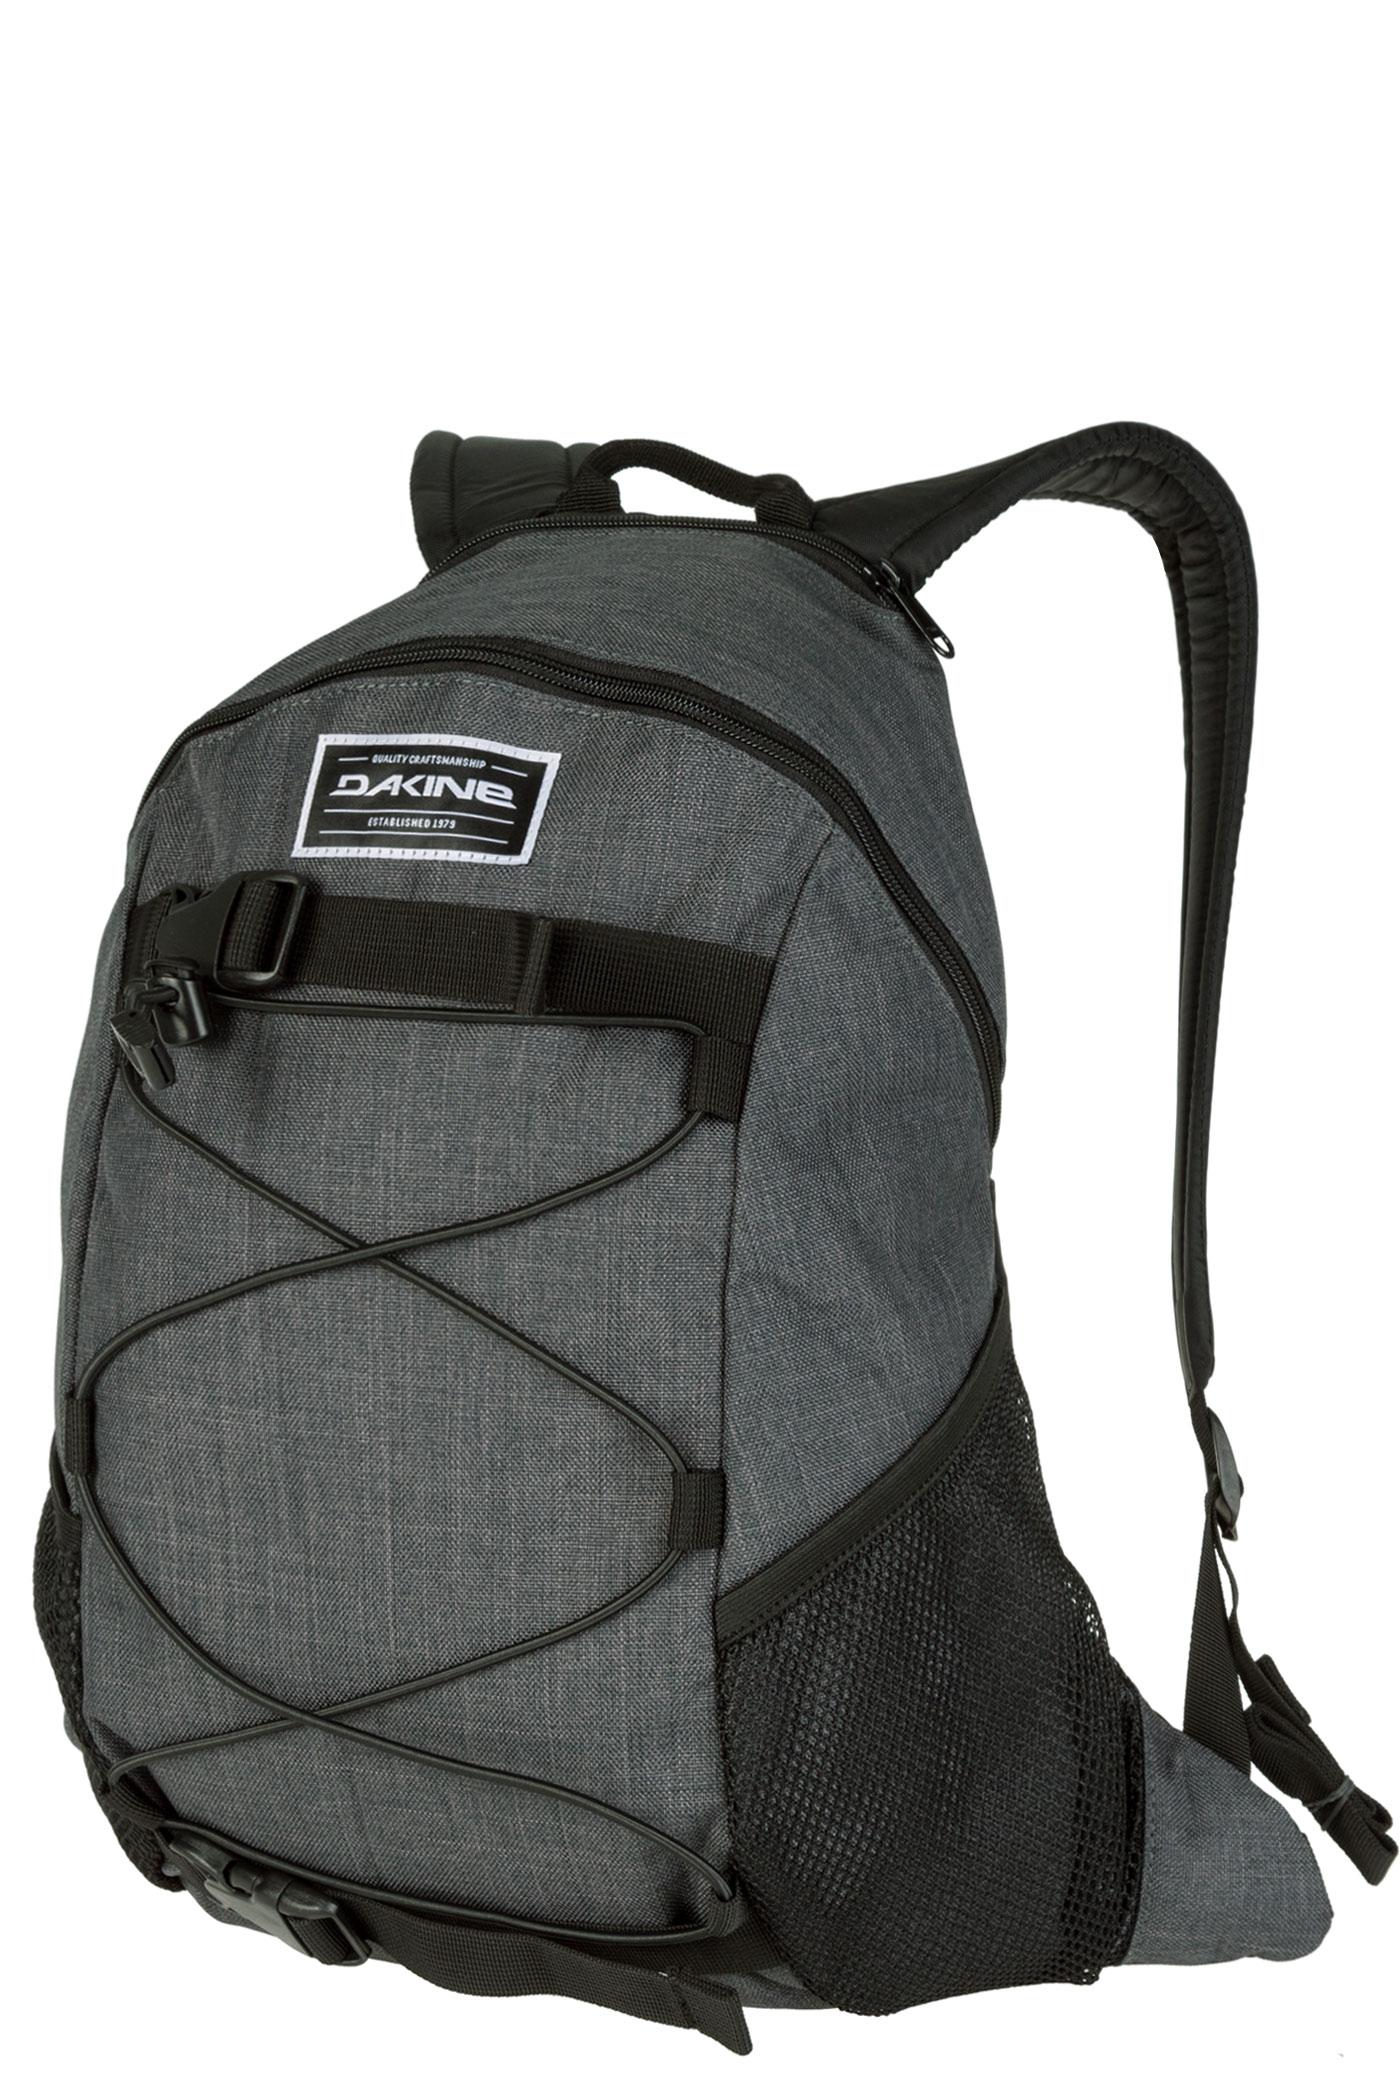 Dakine Wonder Backpack 15L (carbon) buy at skatedeluxe